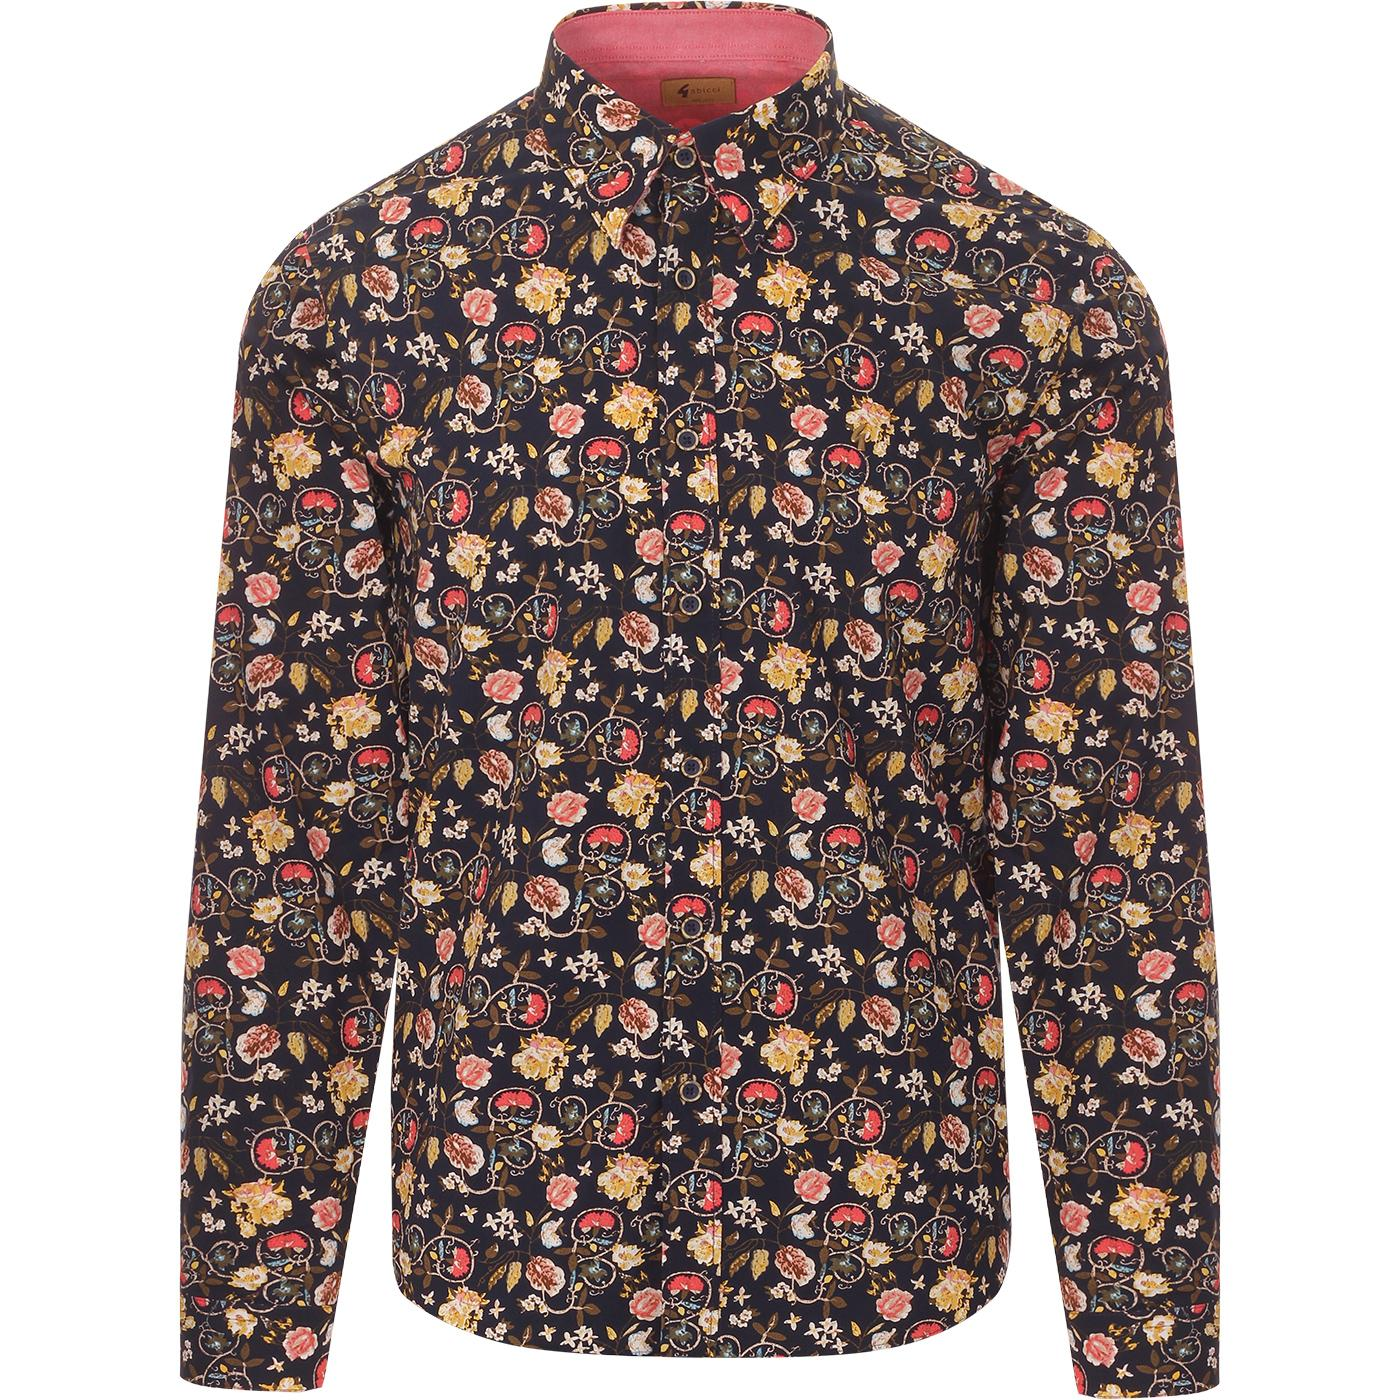 Martin GABICCI VINTAGE 60s Mod Vine Floral Shirt